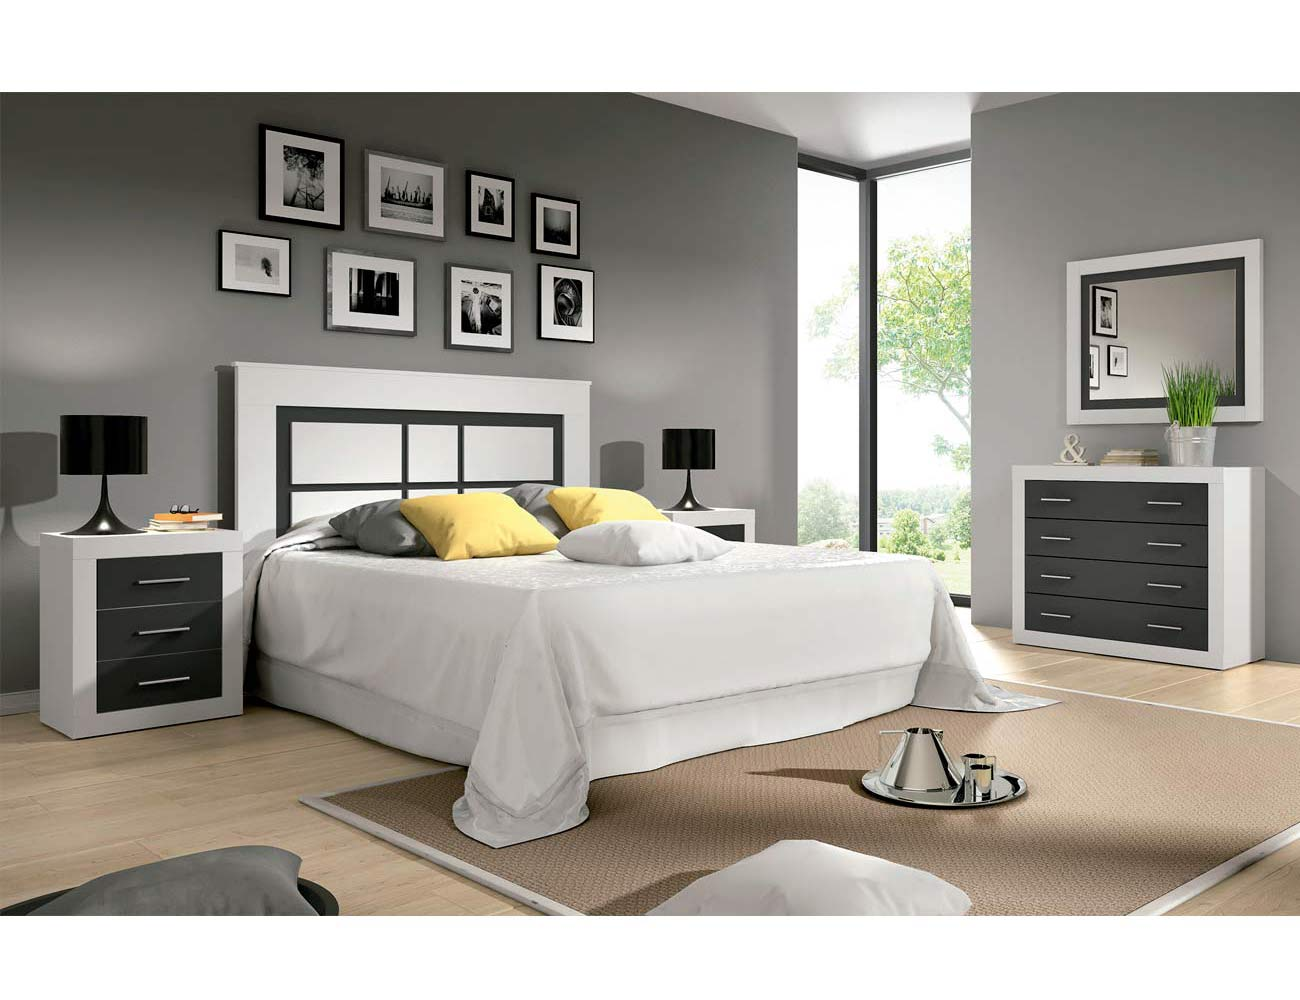 03 dormitorio matrimonio comoda blanco grafito